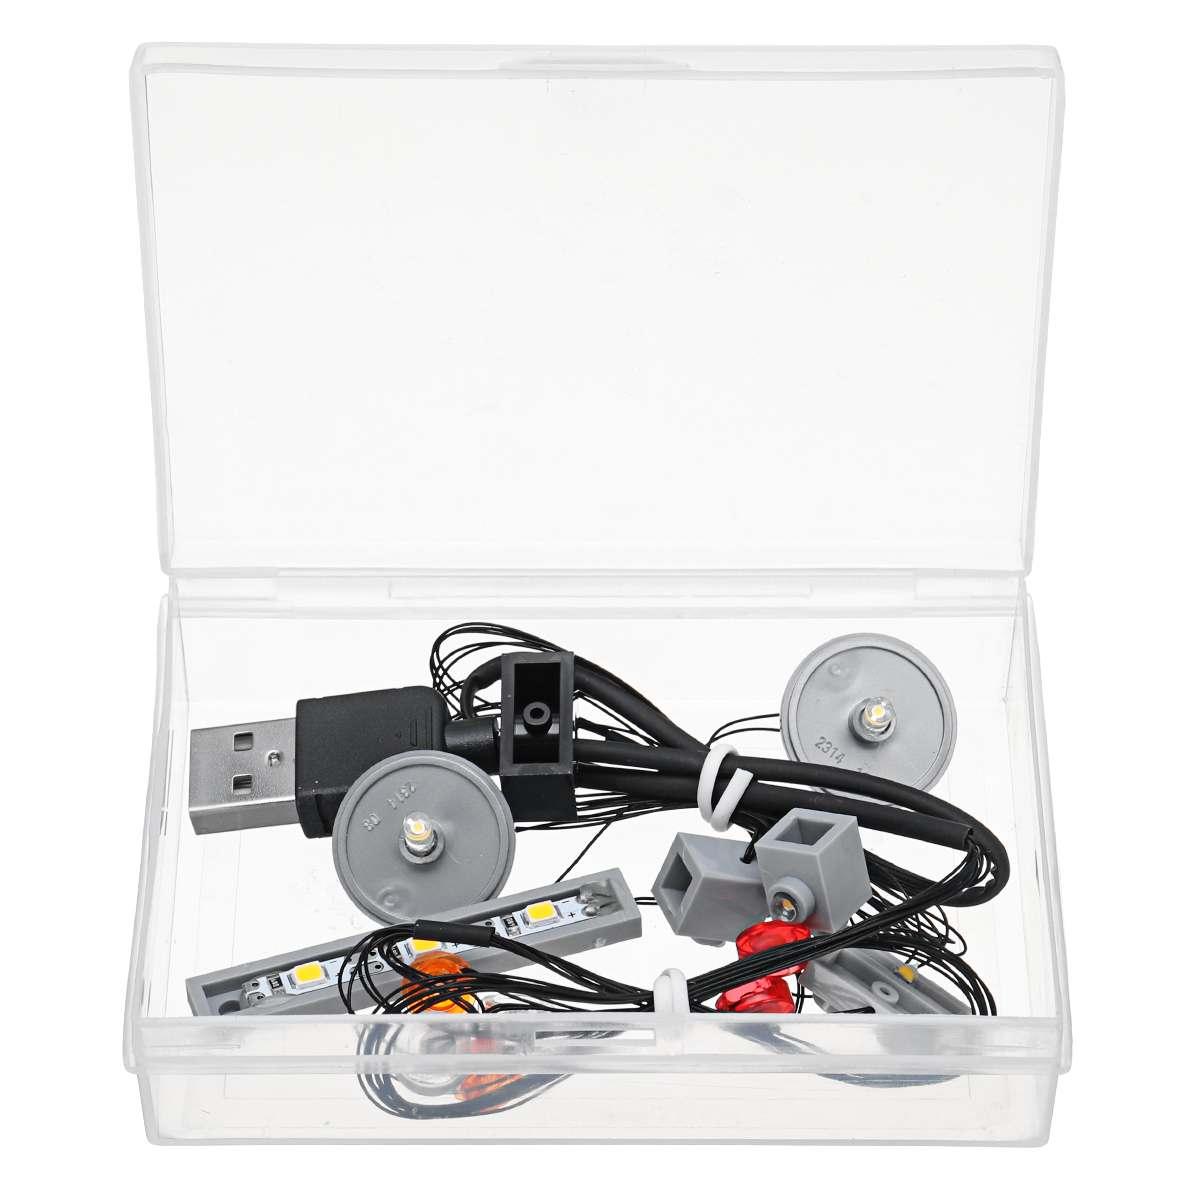 Kit de iluminación de luz LED solo para bloques de construcción 10262 DB5, juego de luces (modelo no incluido)